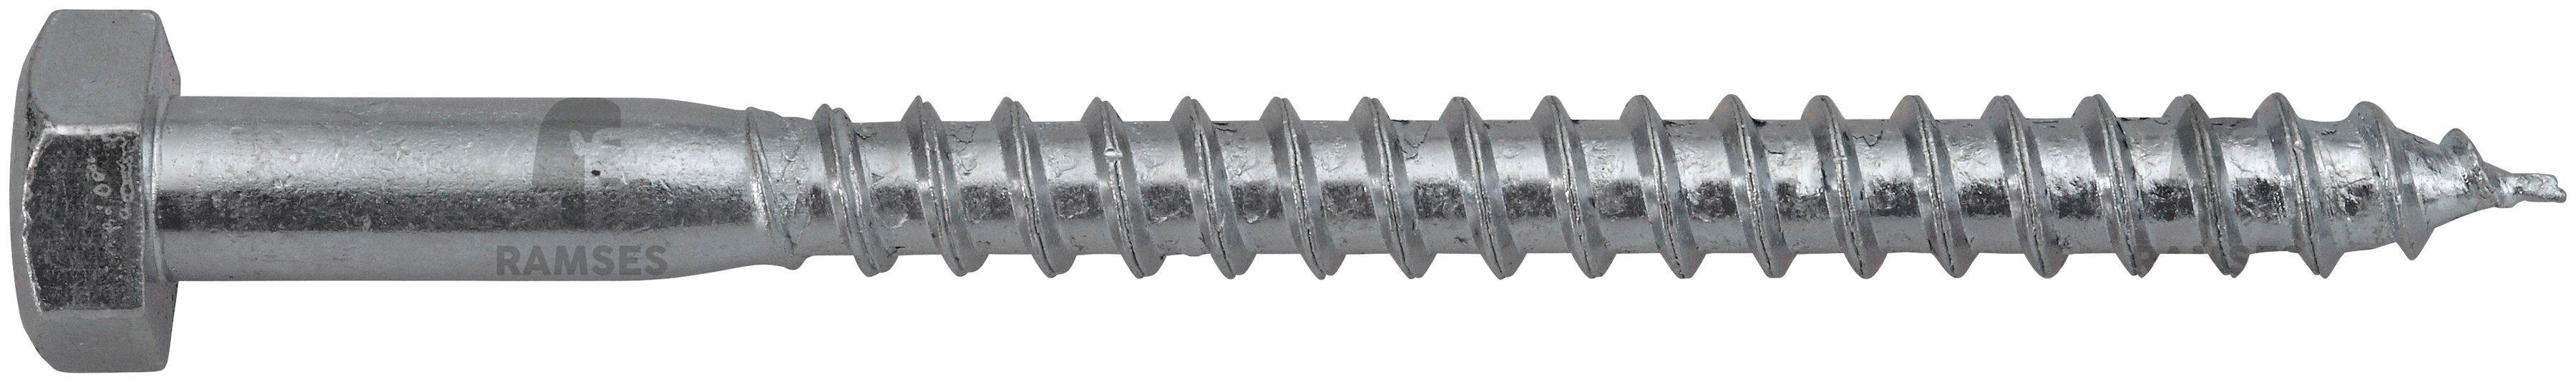 RAMSES Schrauben , Sechskant-Holzschraube 10 x 280 mm 25 Stk.